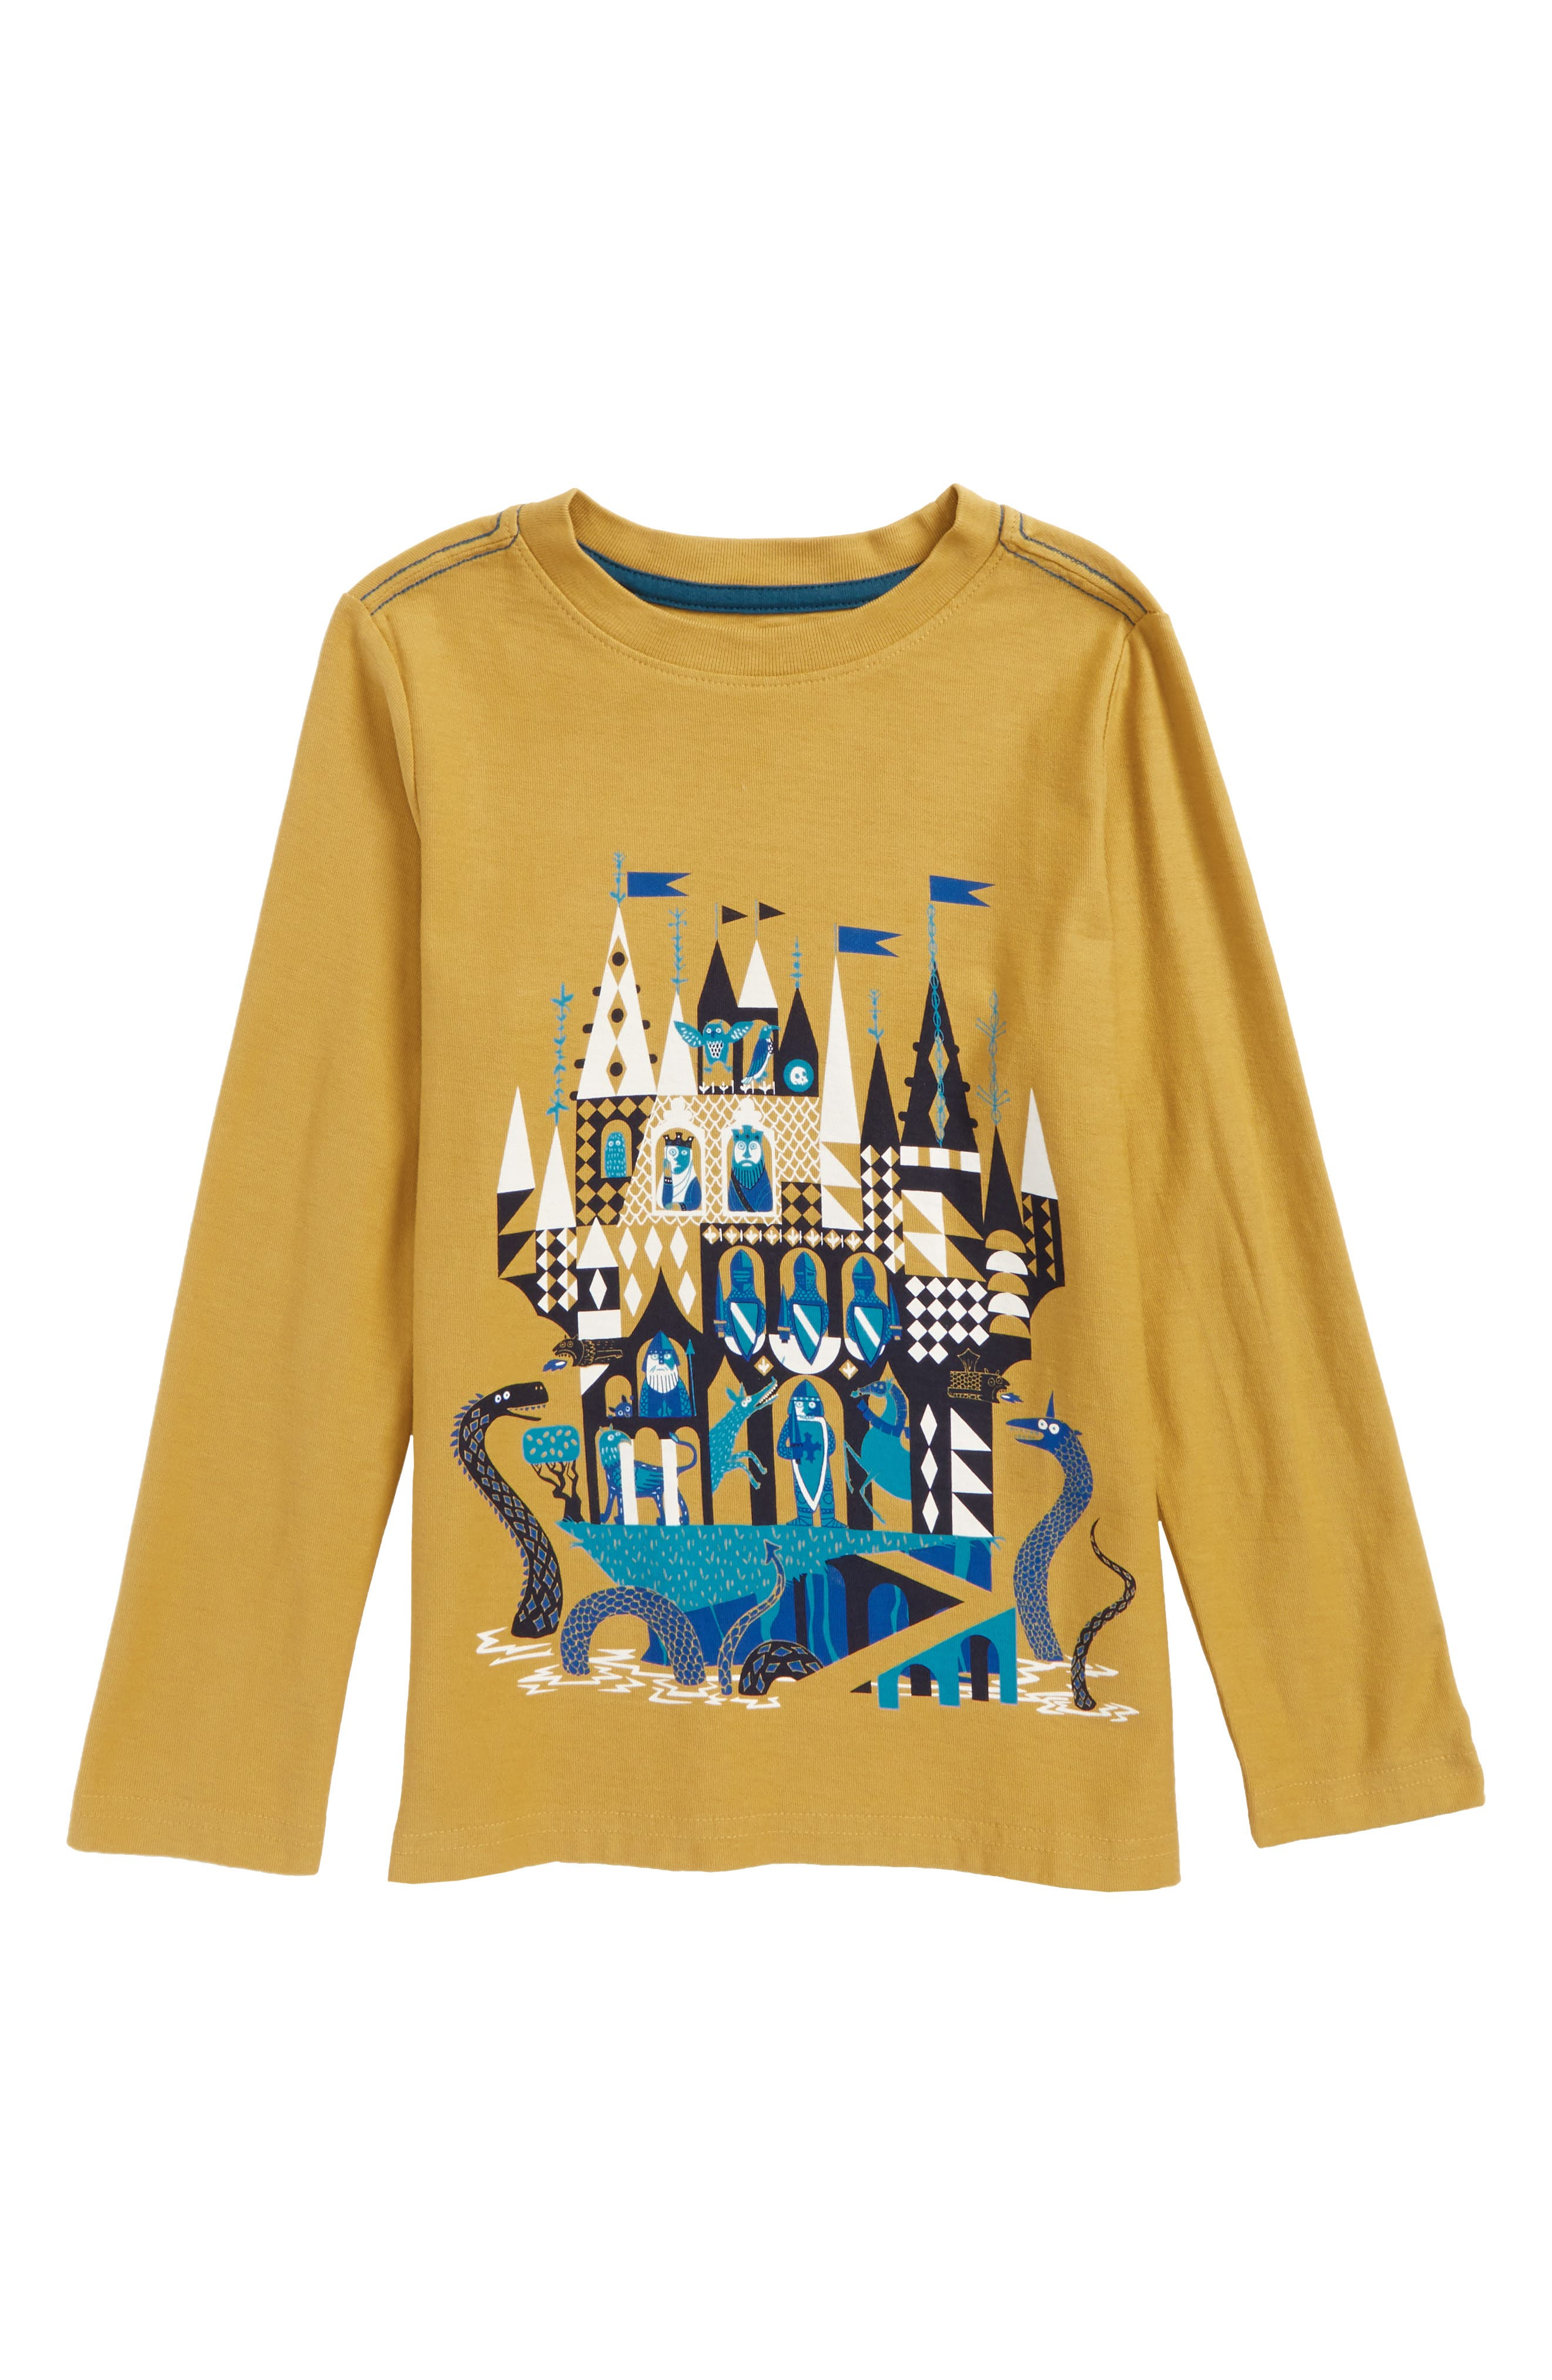 Main Image - Tea Collection Castle Graphic T-Shirt (Toddler Boys & Little Boys)